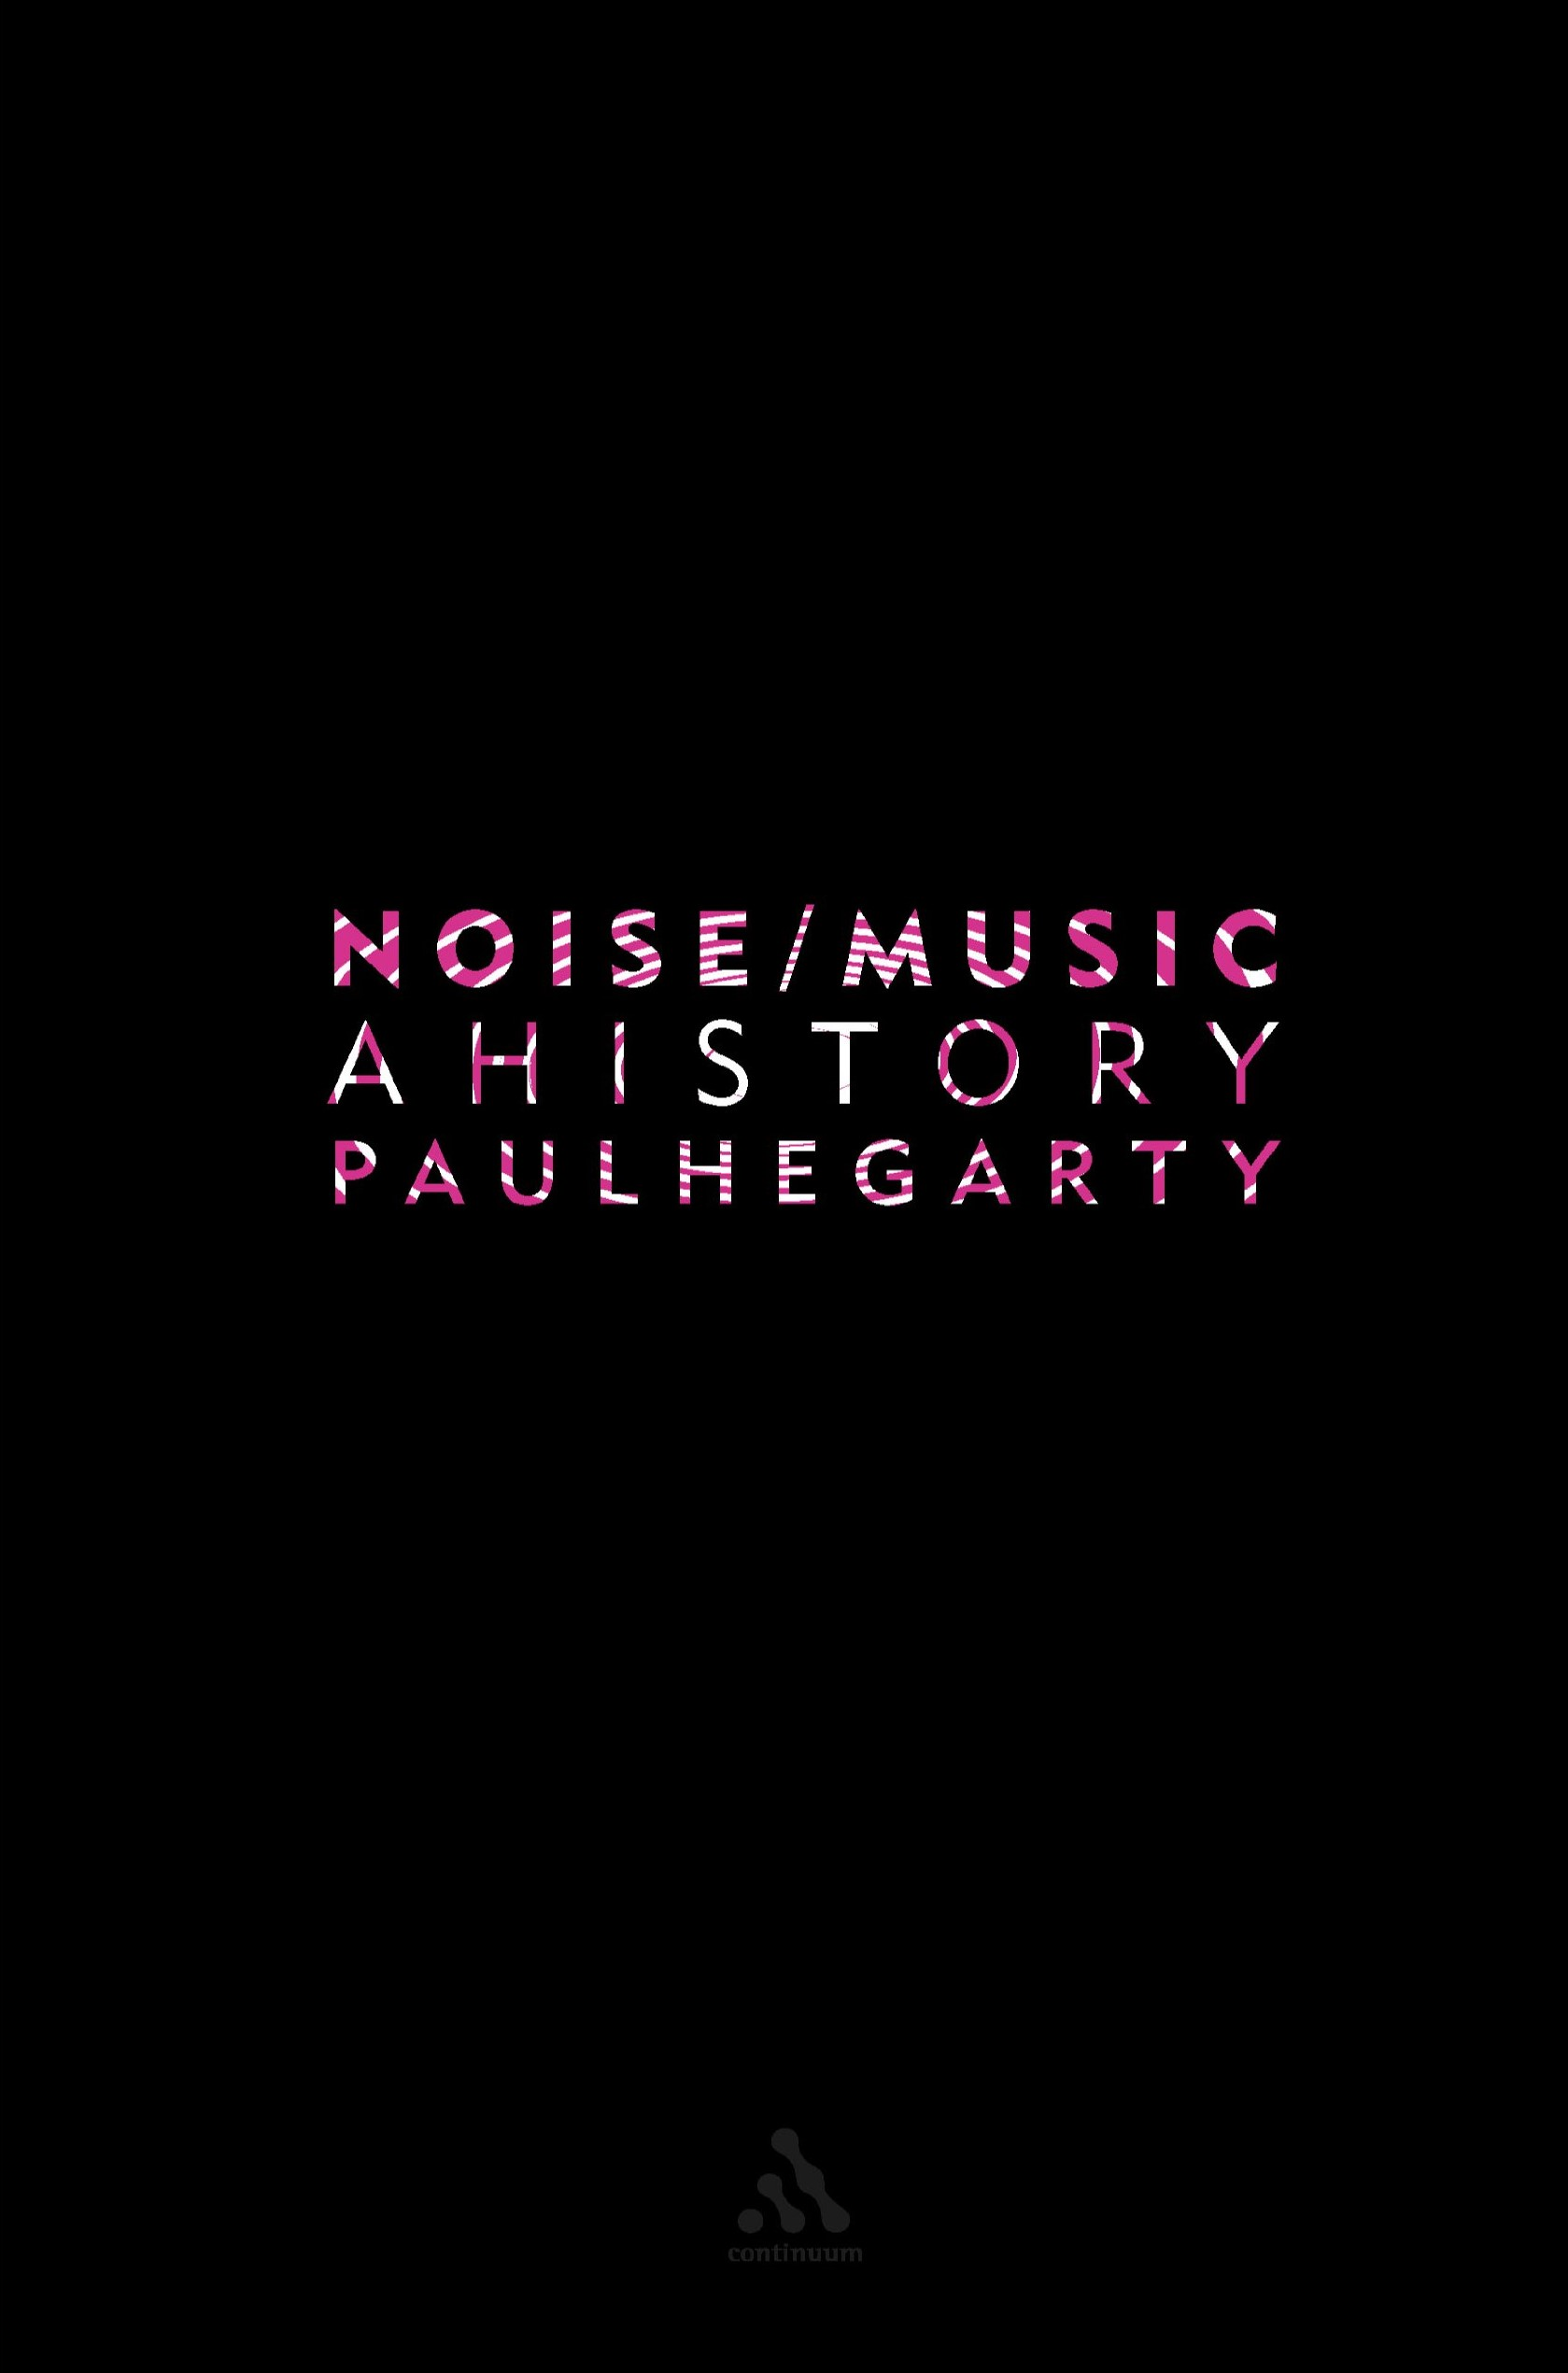 paul-hegarty-noise-music-a-history